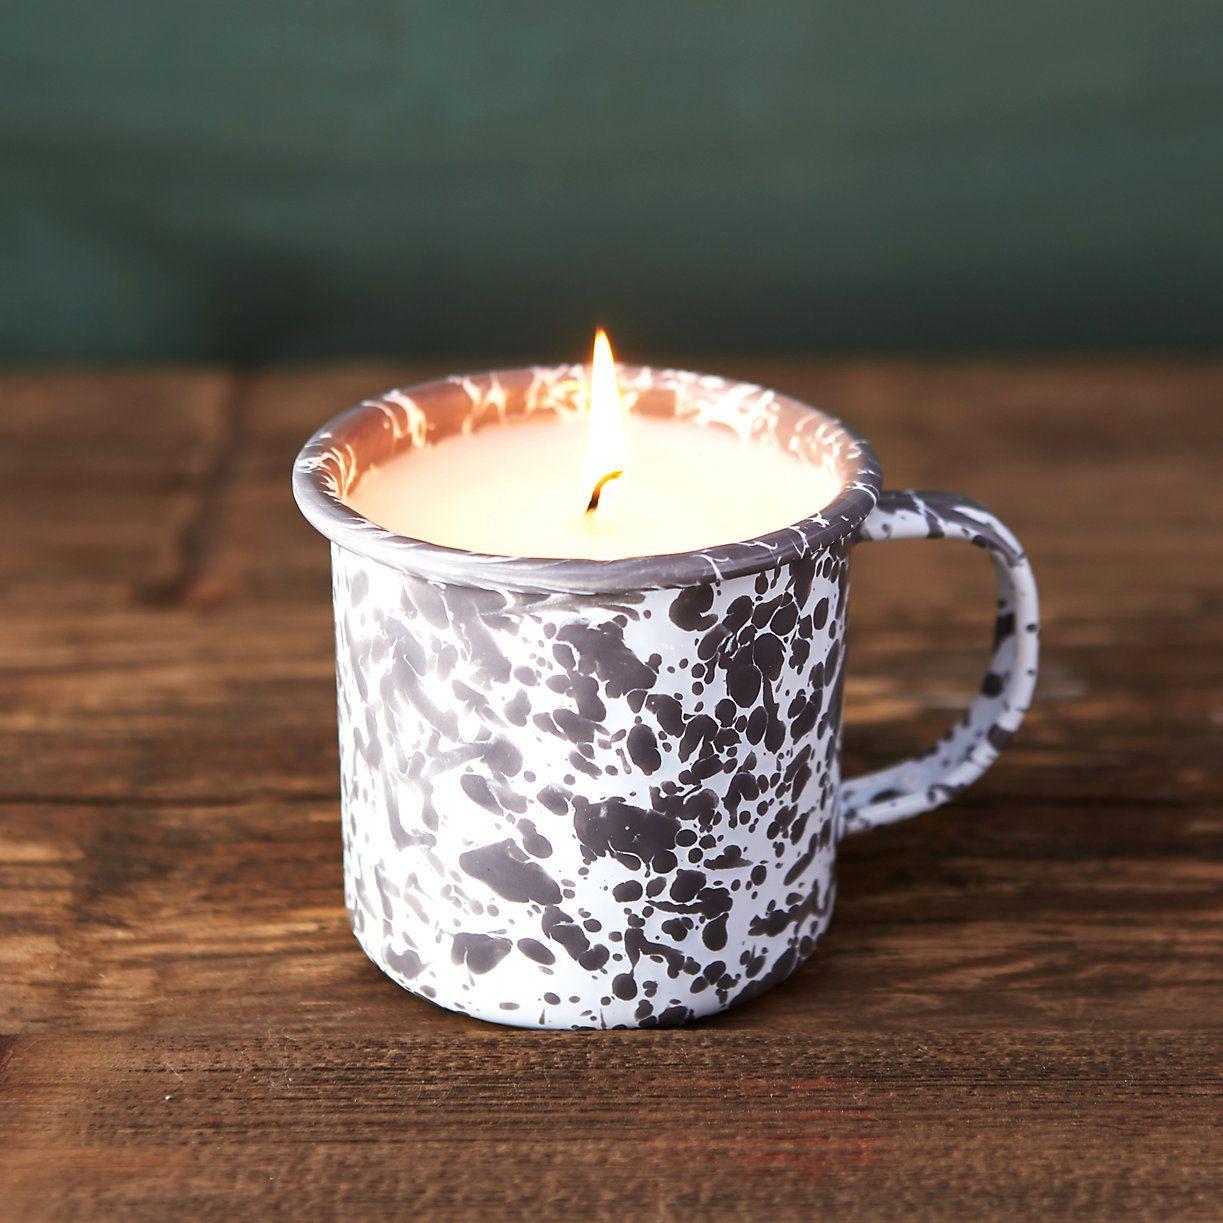 Soy Candle Botanical Candle Vintage Mug Candle Pomegranate Cider Scented Crystal Candle Natural Candle Vintage Candle